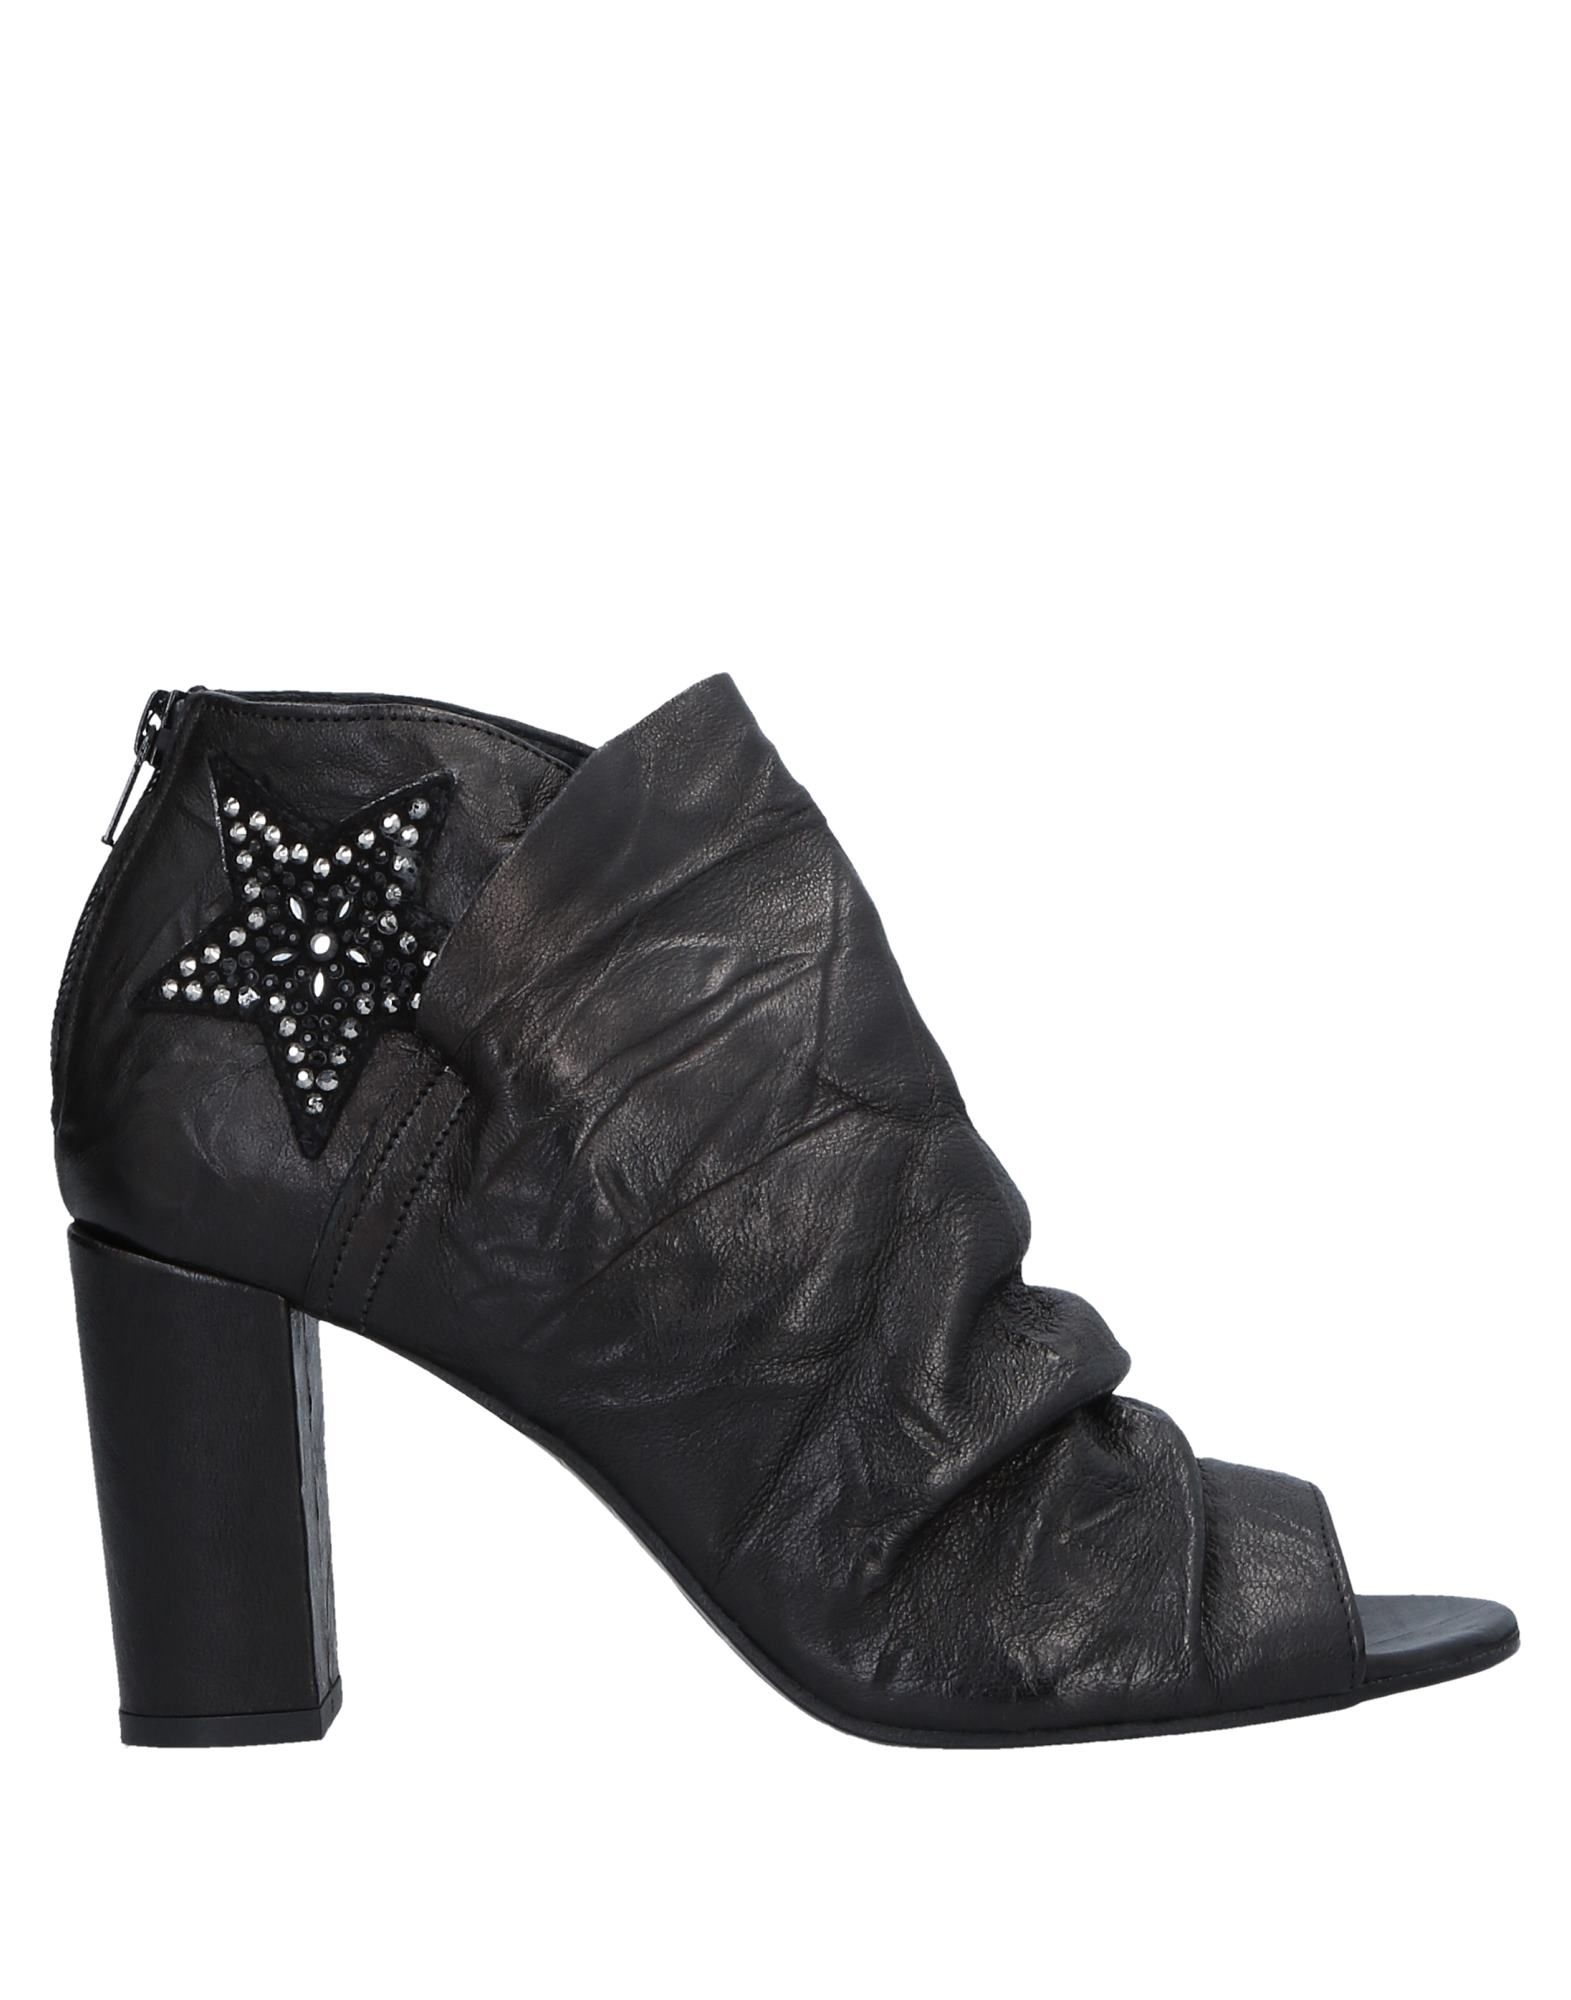 Gut um billige Schuhe zu 11518055LD tragenMimmu Stiefelette Damen  11518055LD zu 191f38